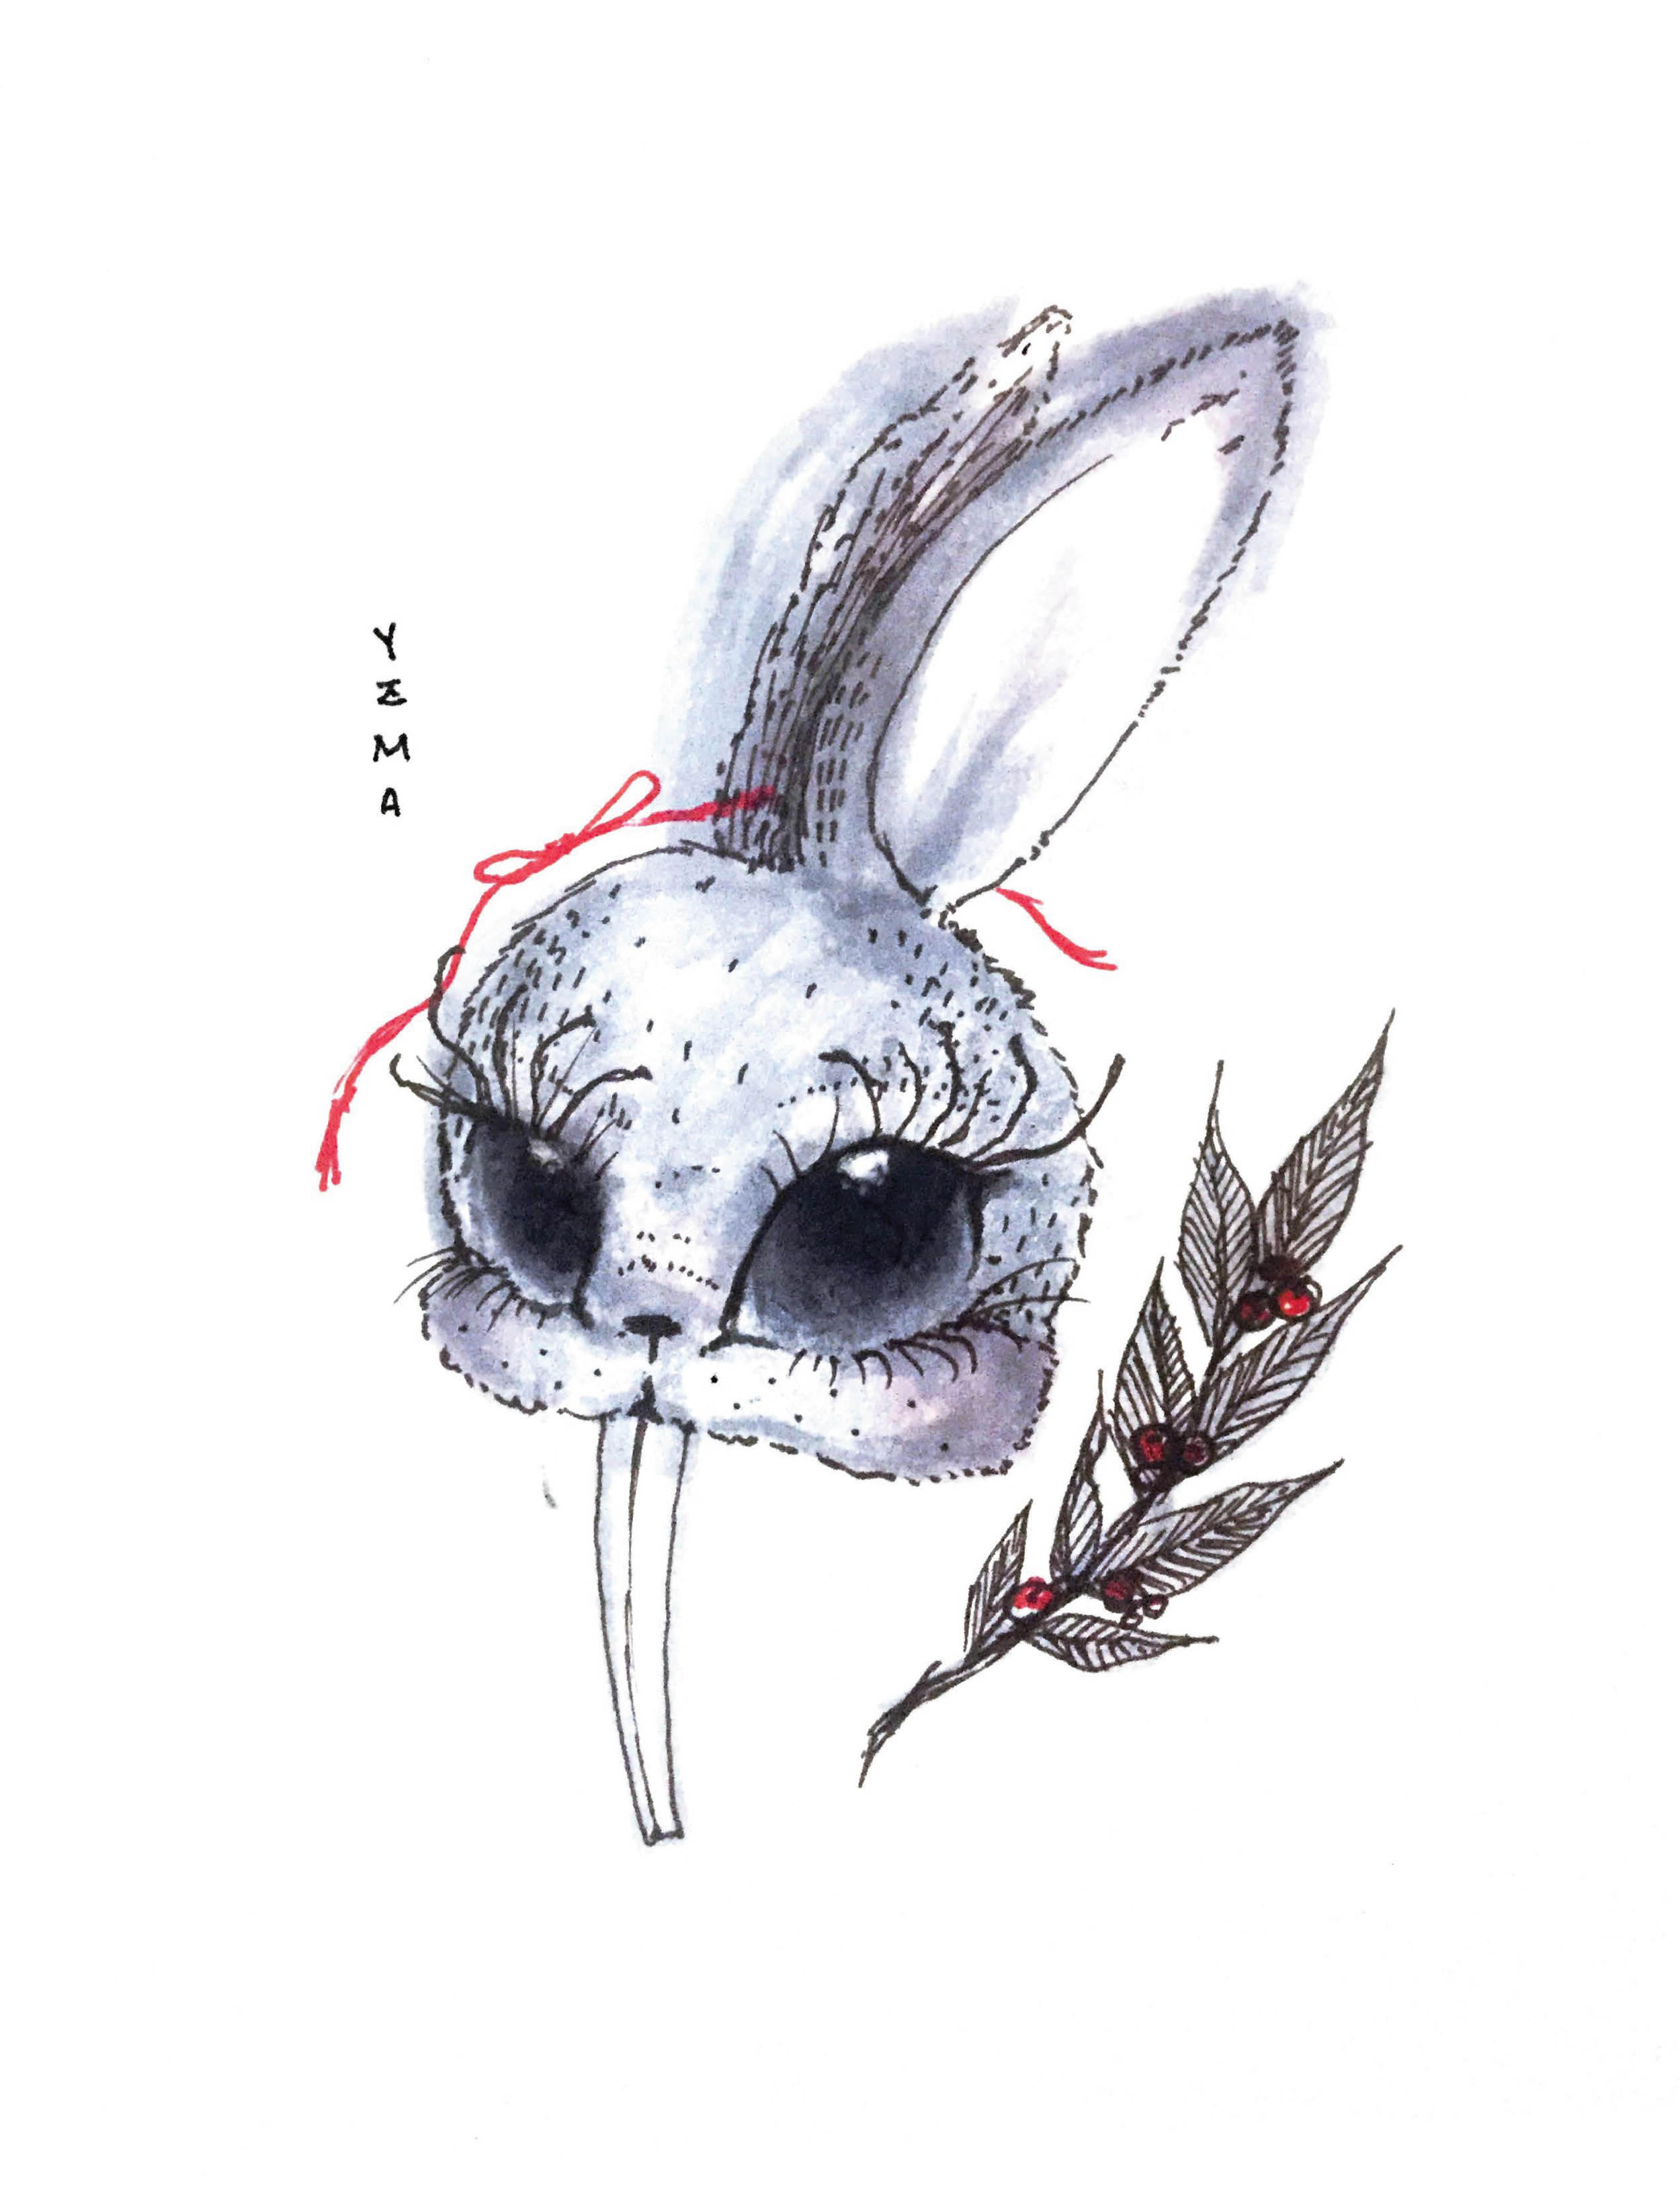 Yzma as a Bunny